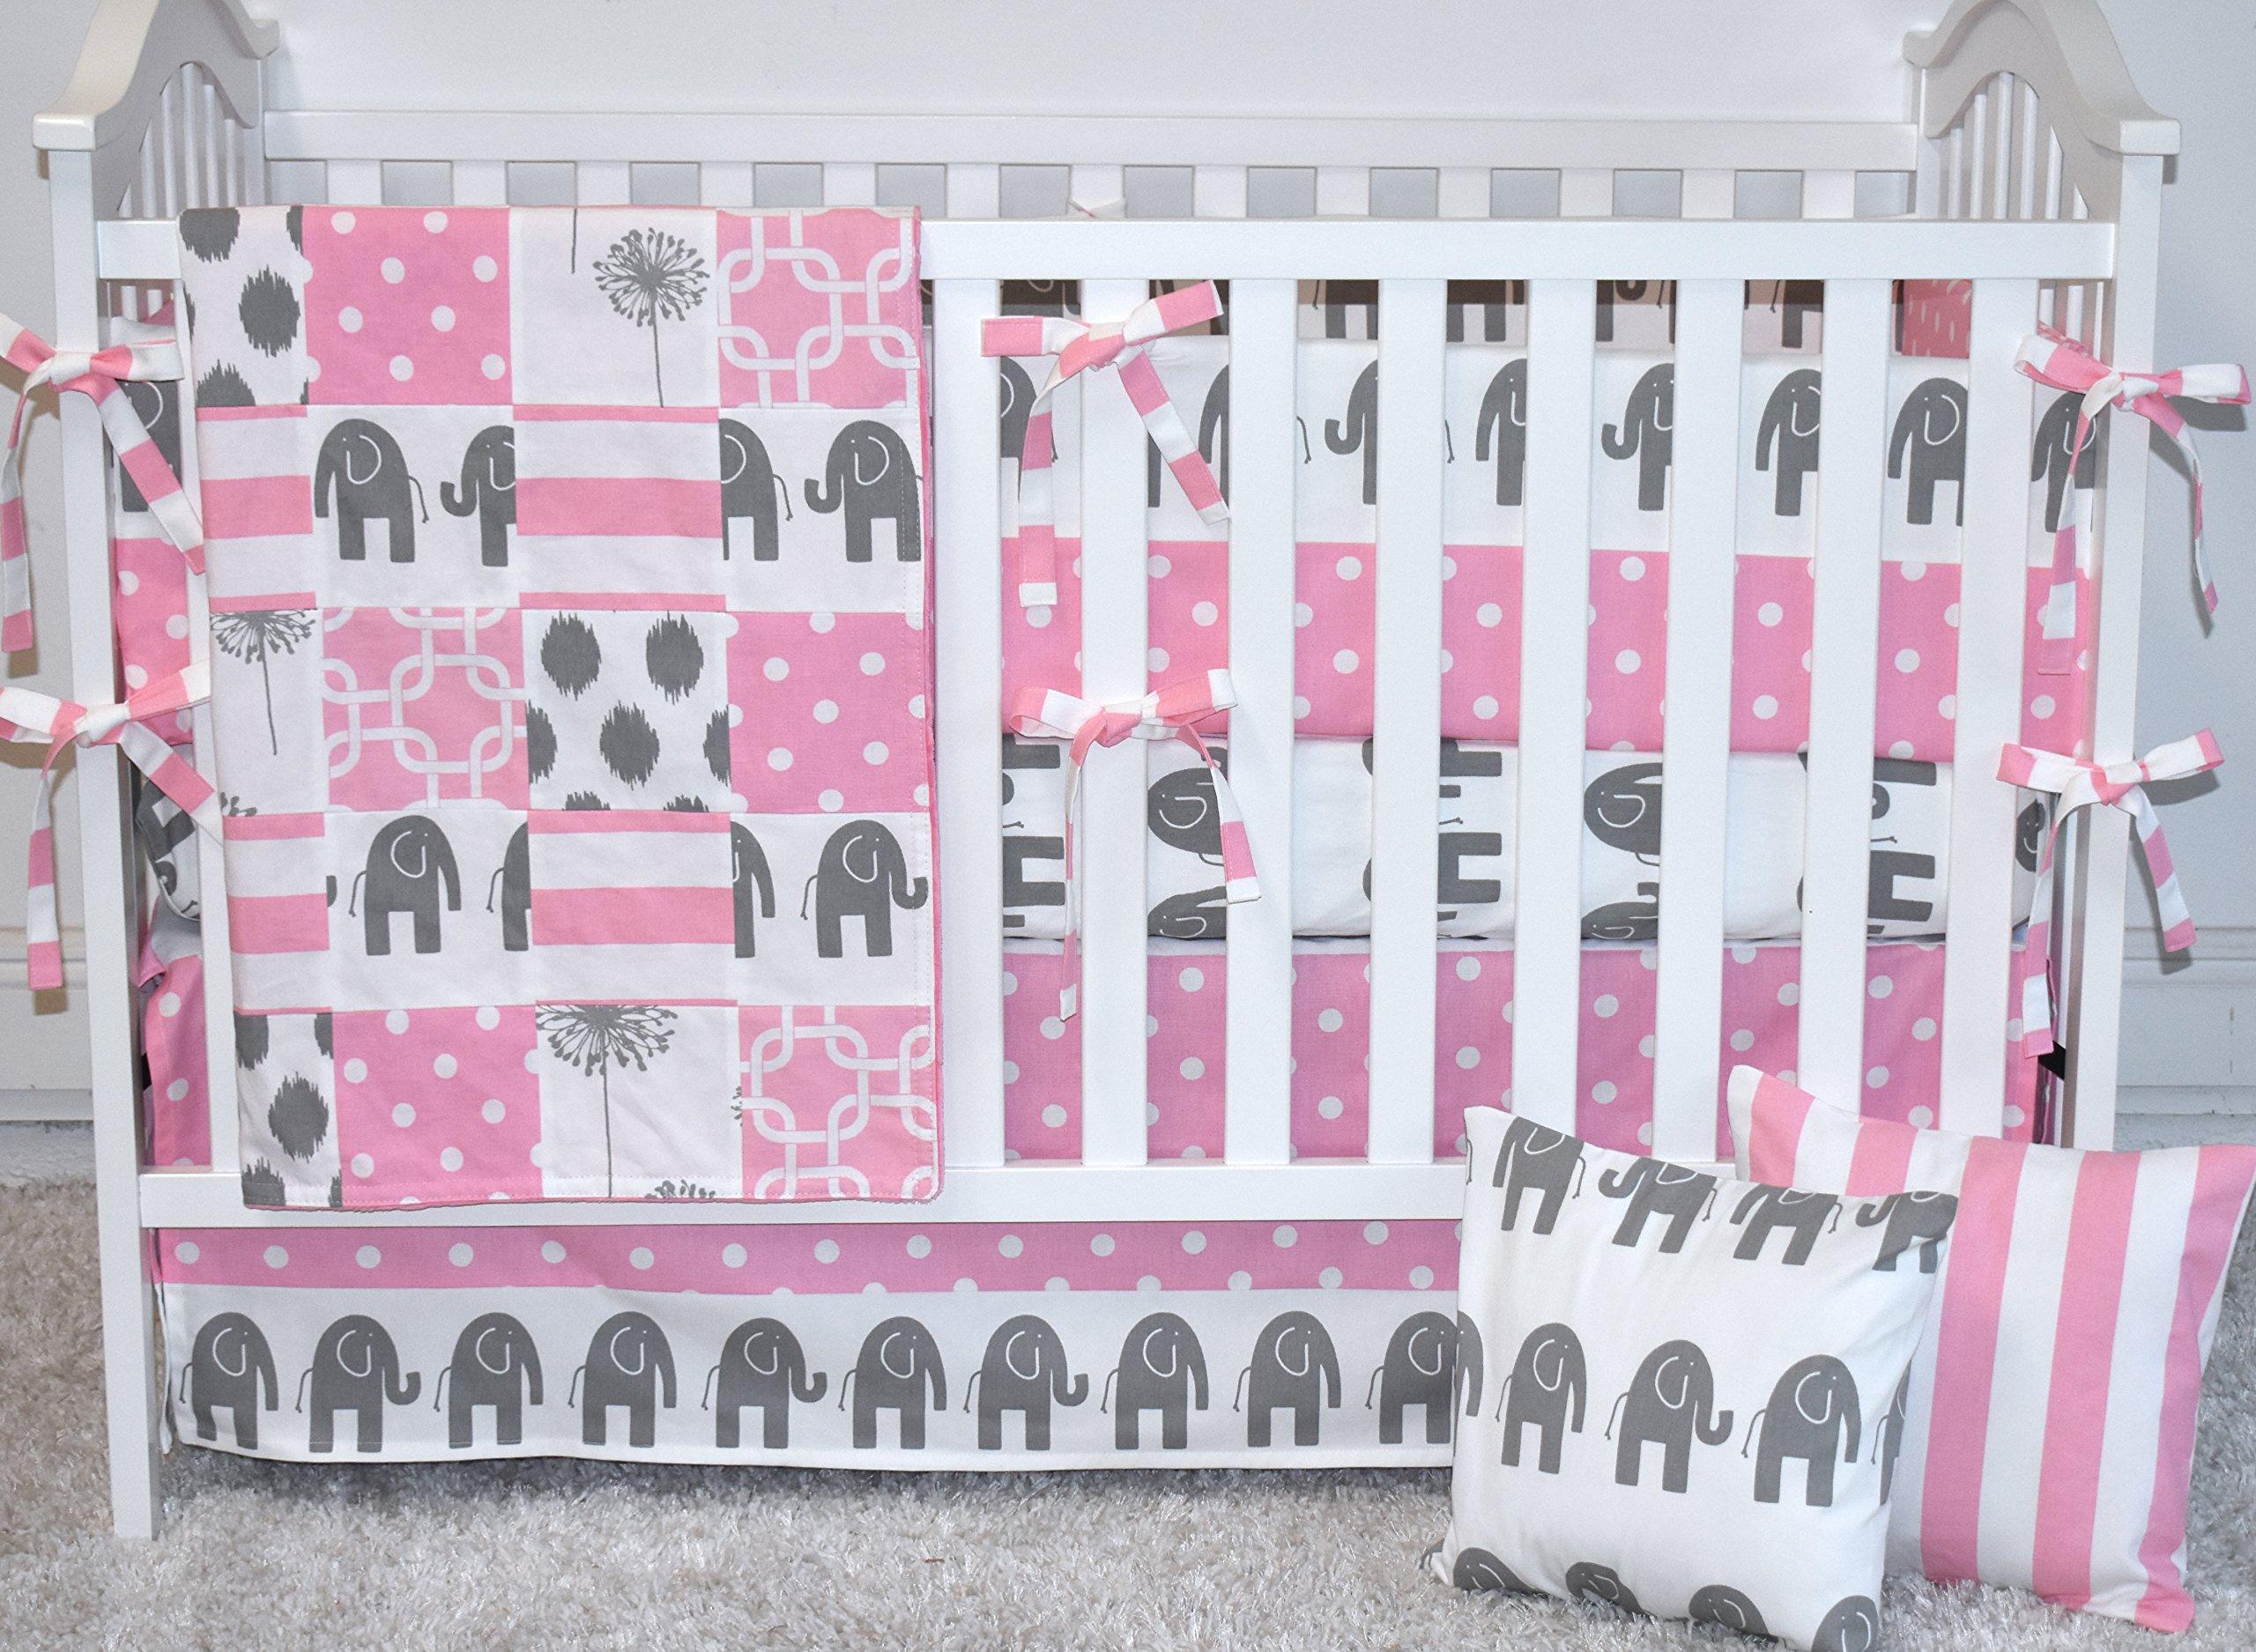 5 piece set - Baby Pink Elephants Crib bedding, bumpers, skirt, fitted sheet, safari theme